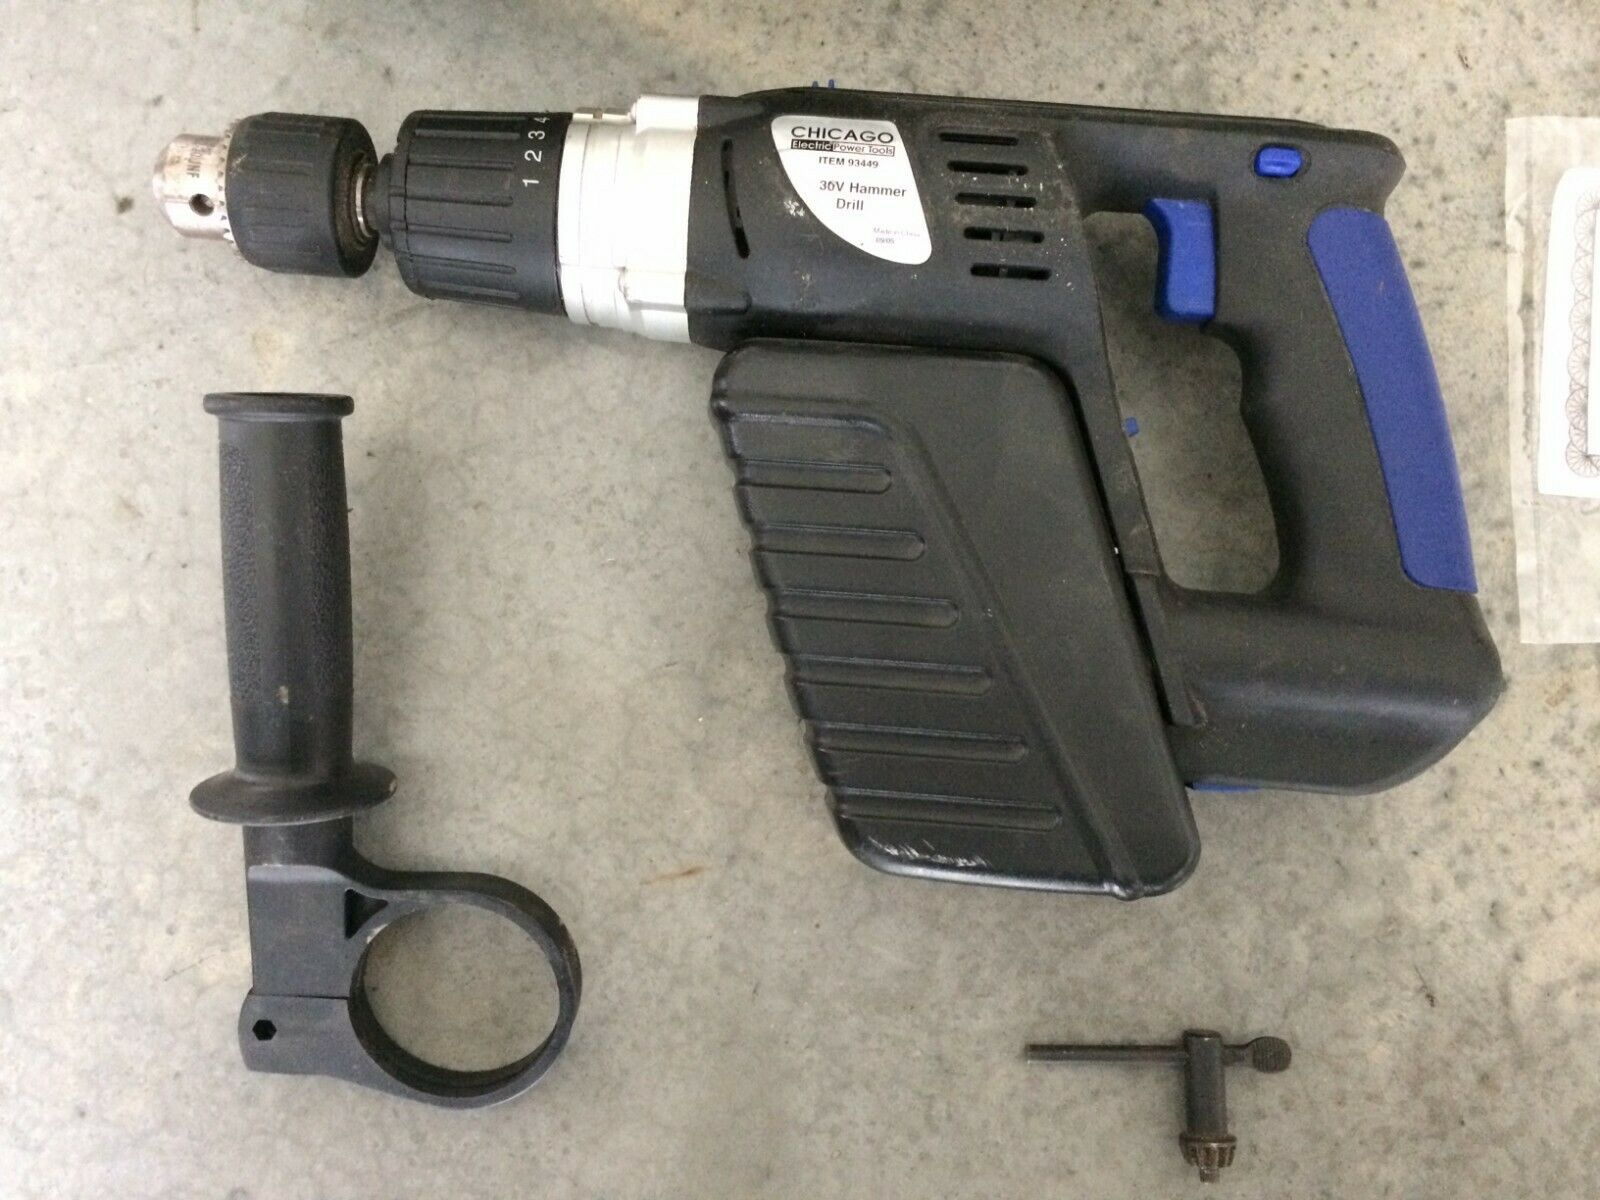 Chicago Electric Item 93449 30V Cordless Hammer Drill Heavy